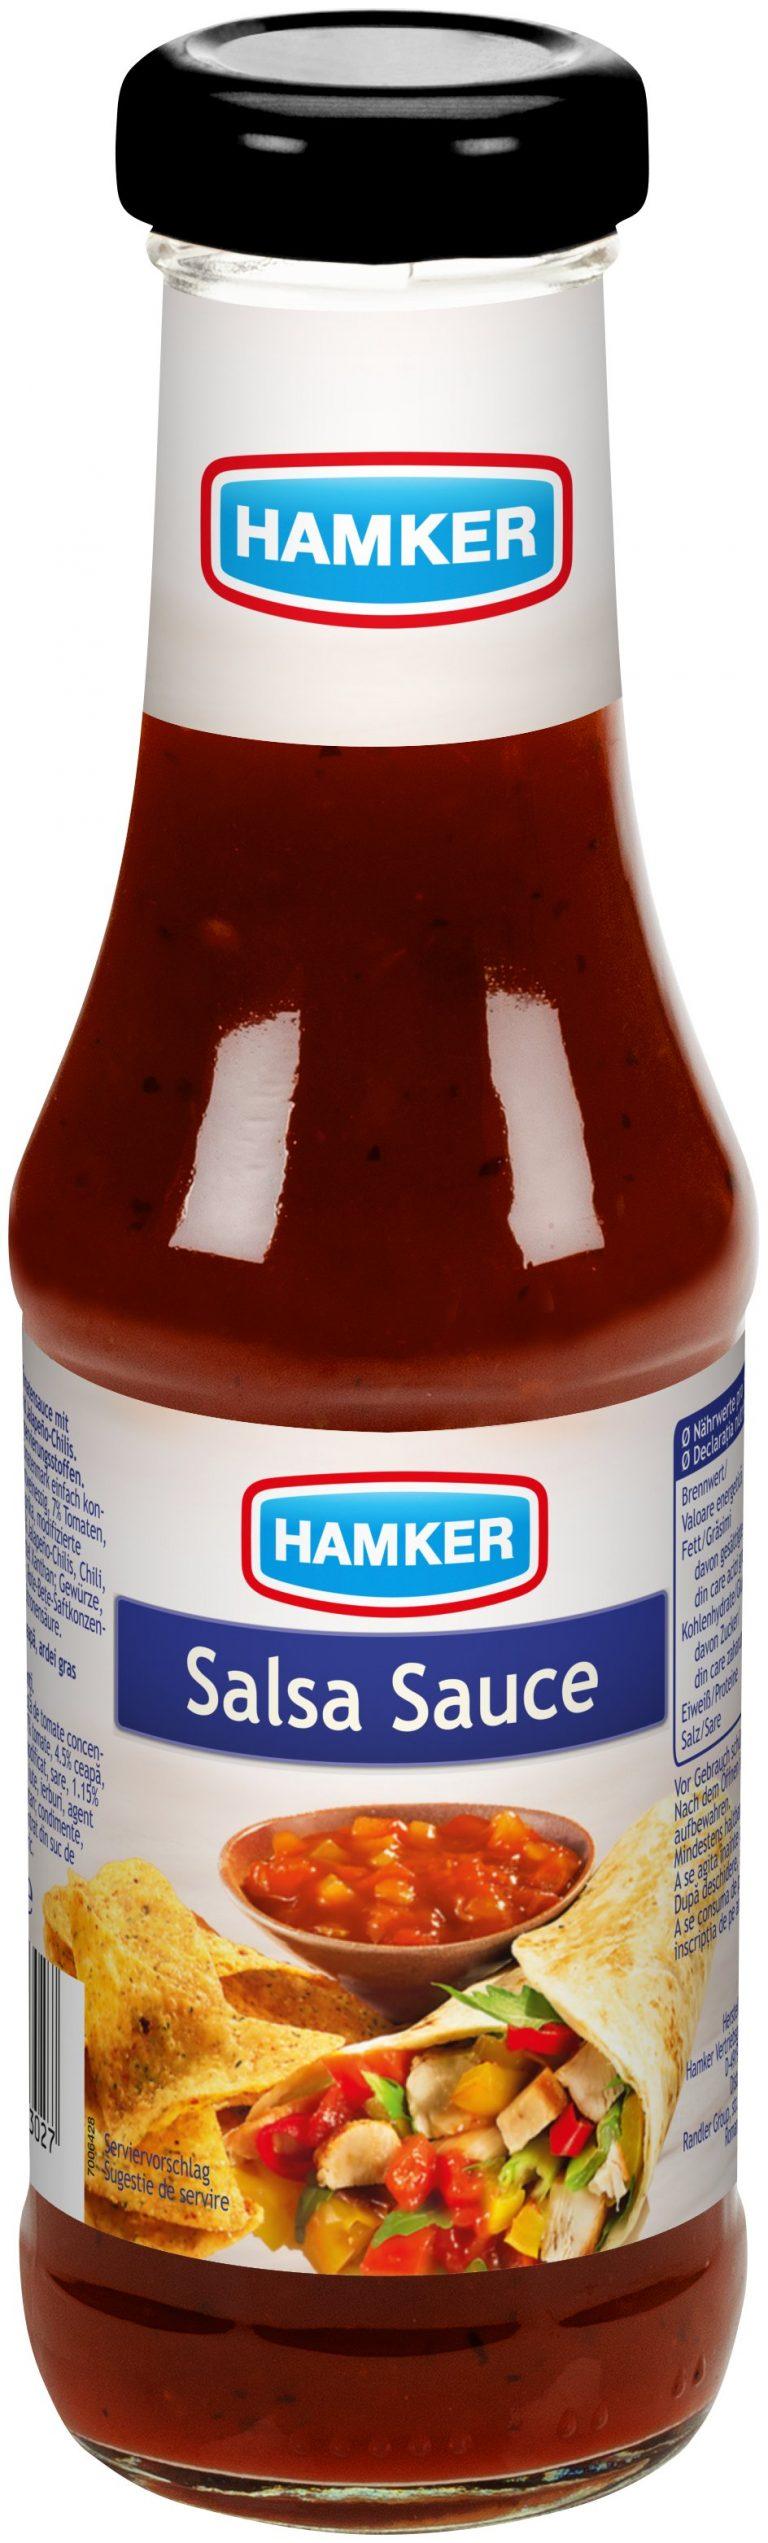 hamker_salsa_sauce_300ml